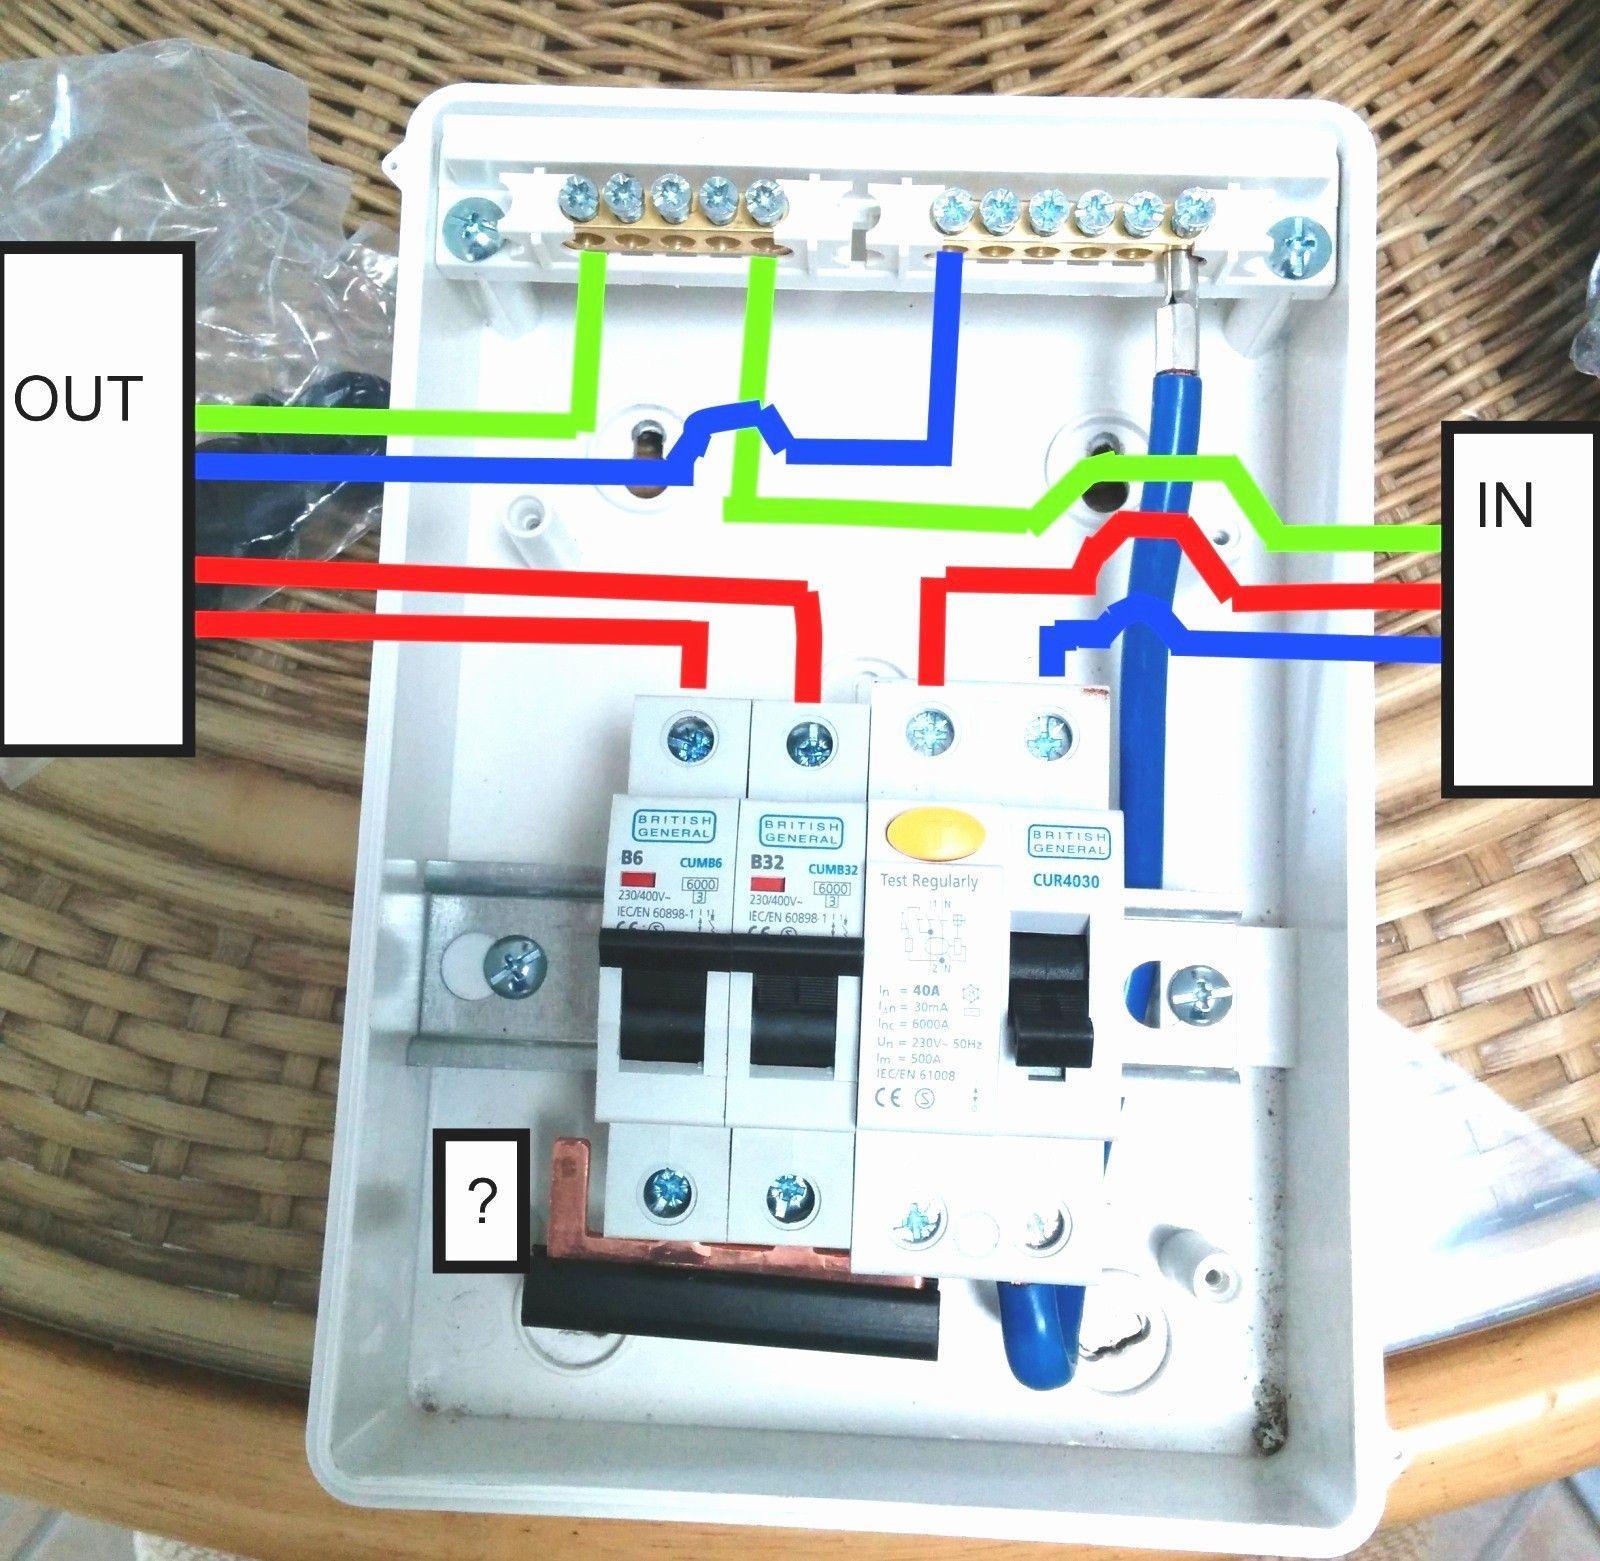 Unique Wiring Diagram For A Garage Consumer Unit Diagram Diagramtemplate Diagramsample Diagram Car Audio Installation The Unit